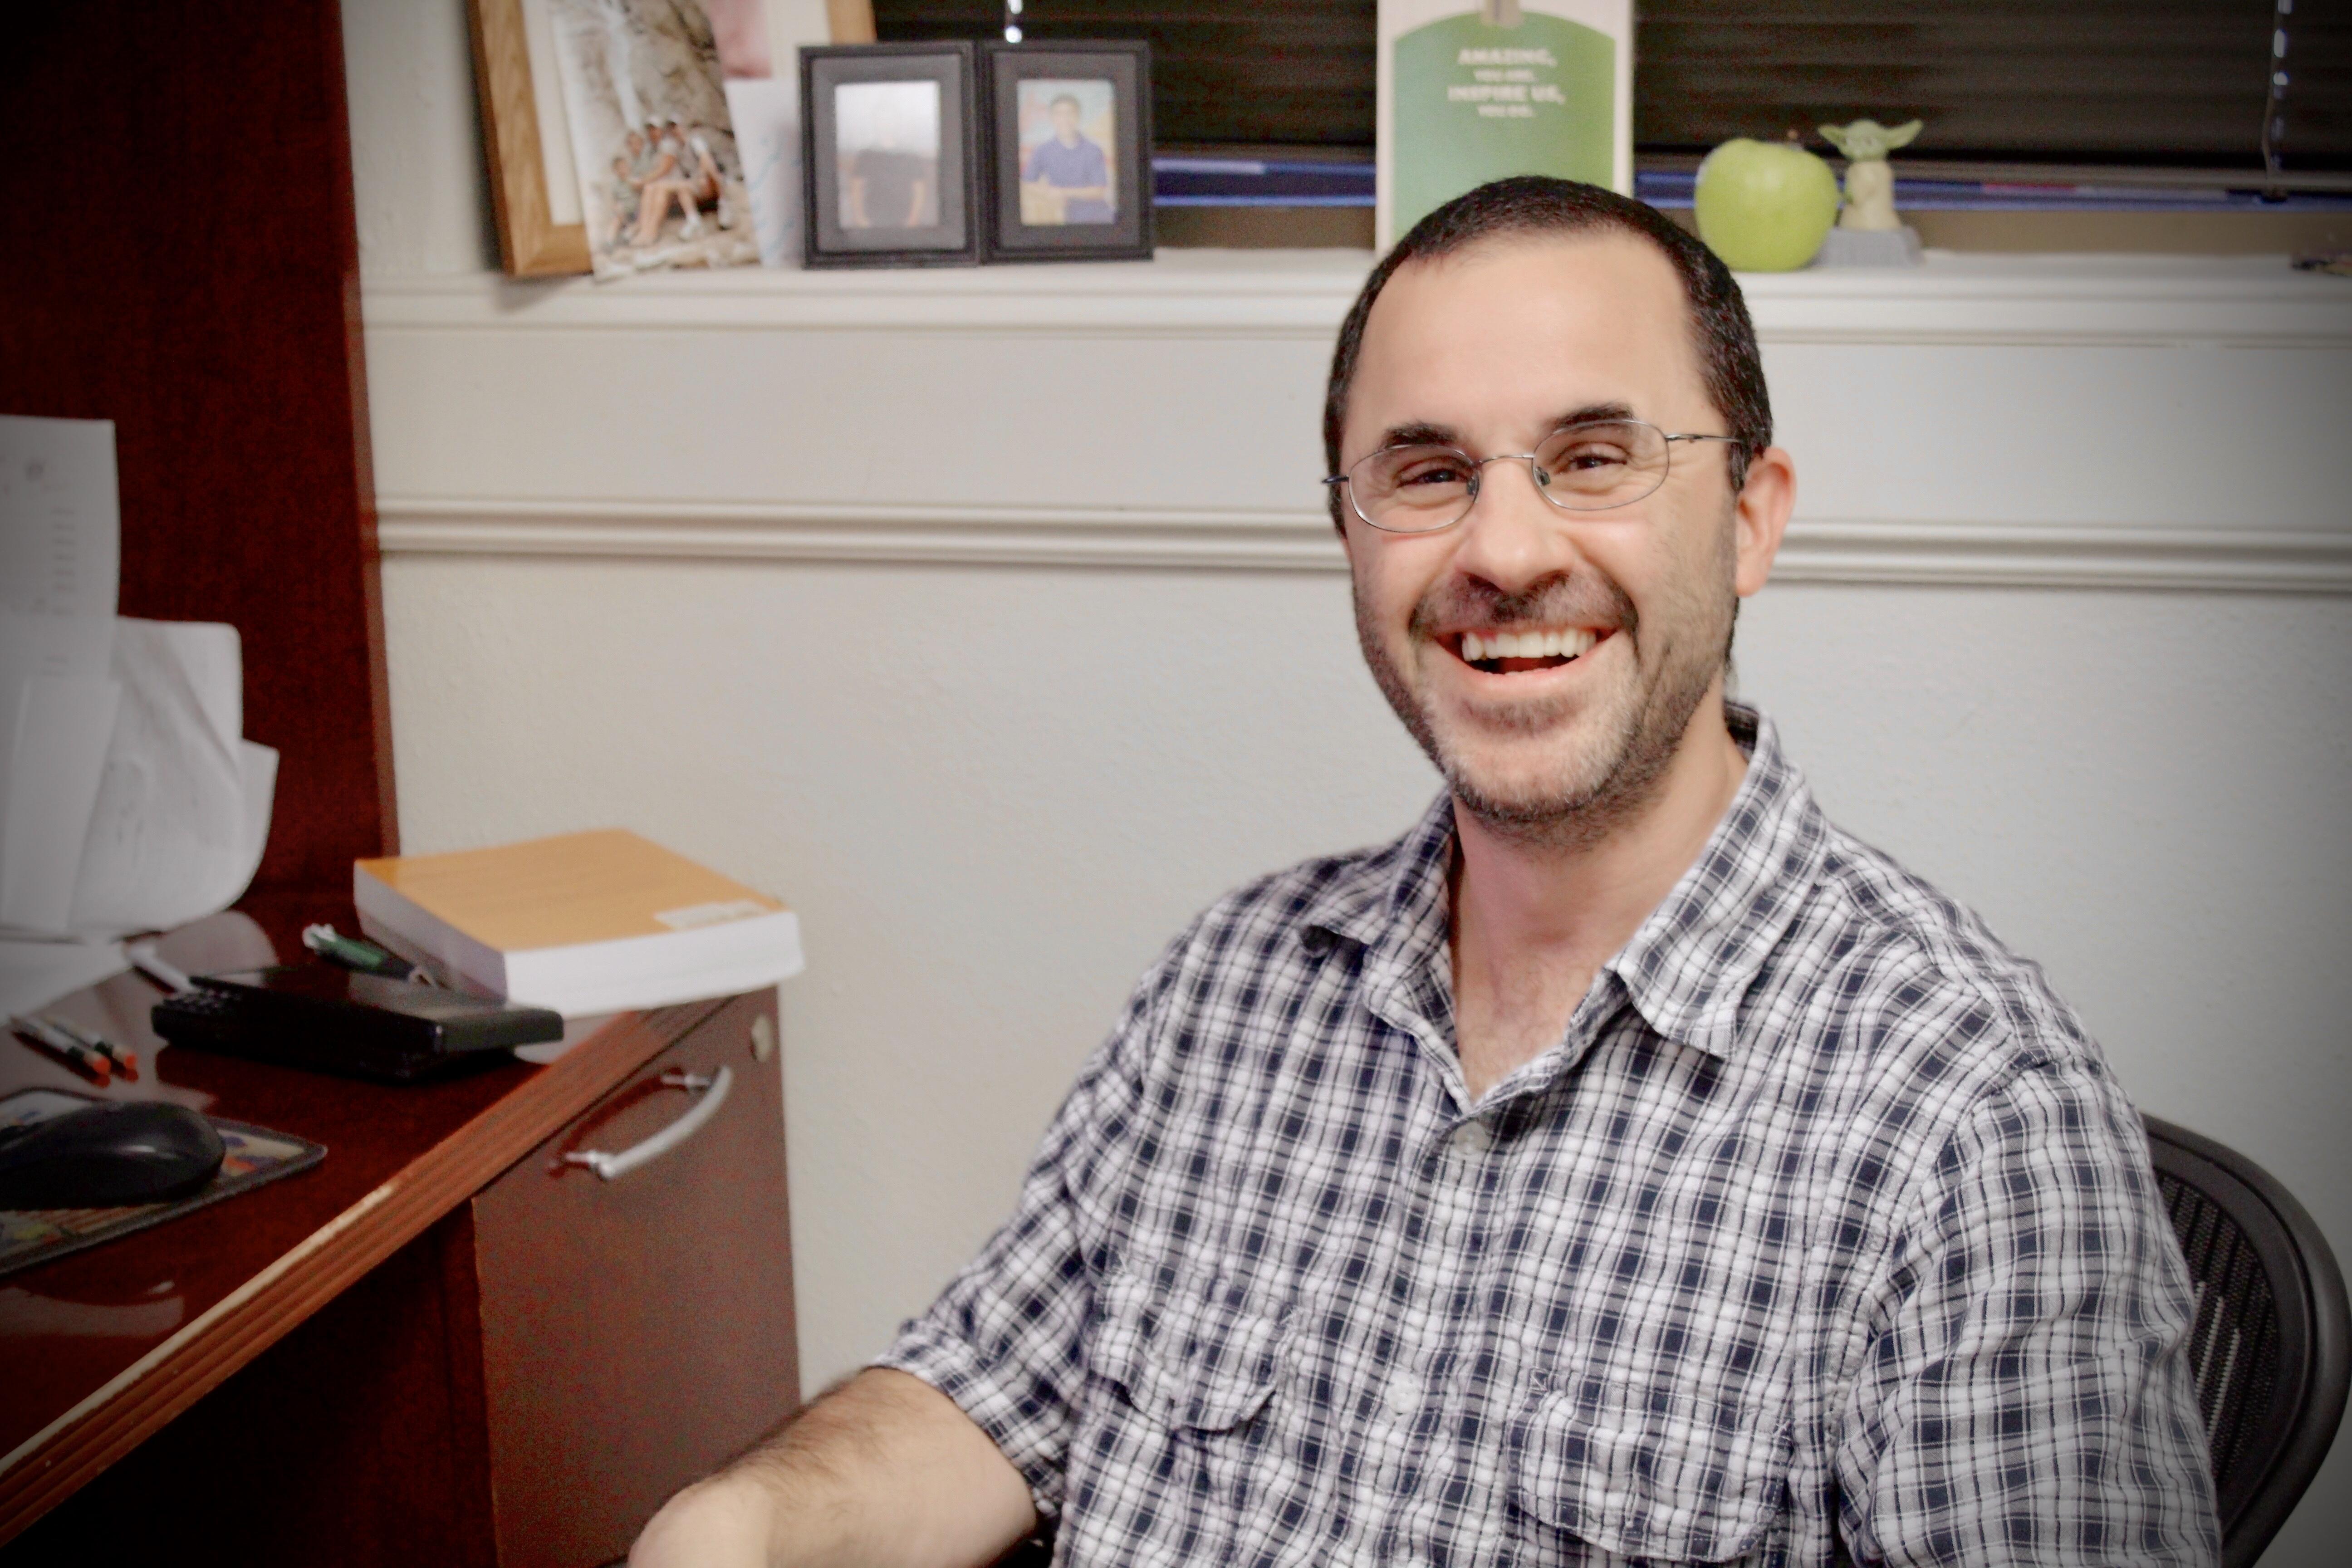 Dr. Charles Criscione